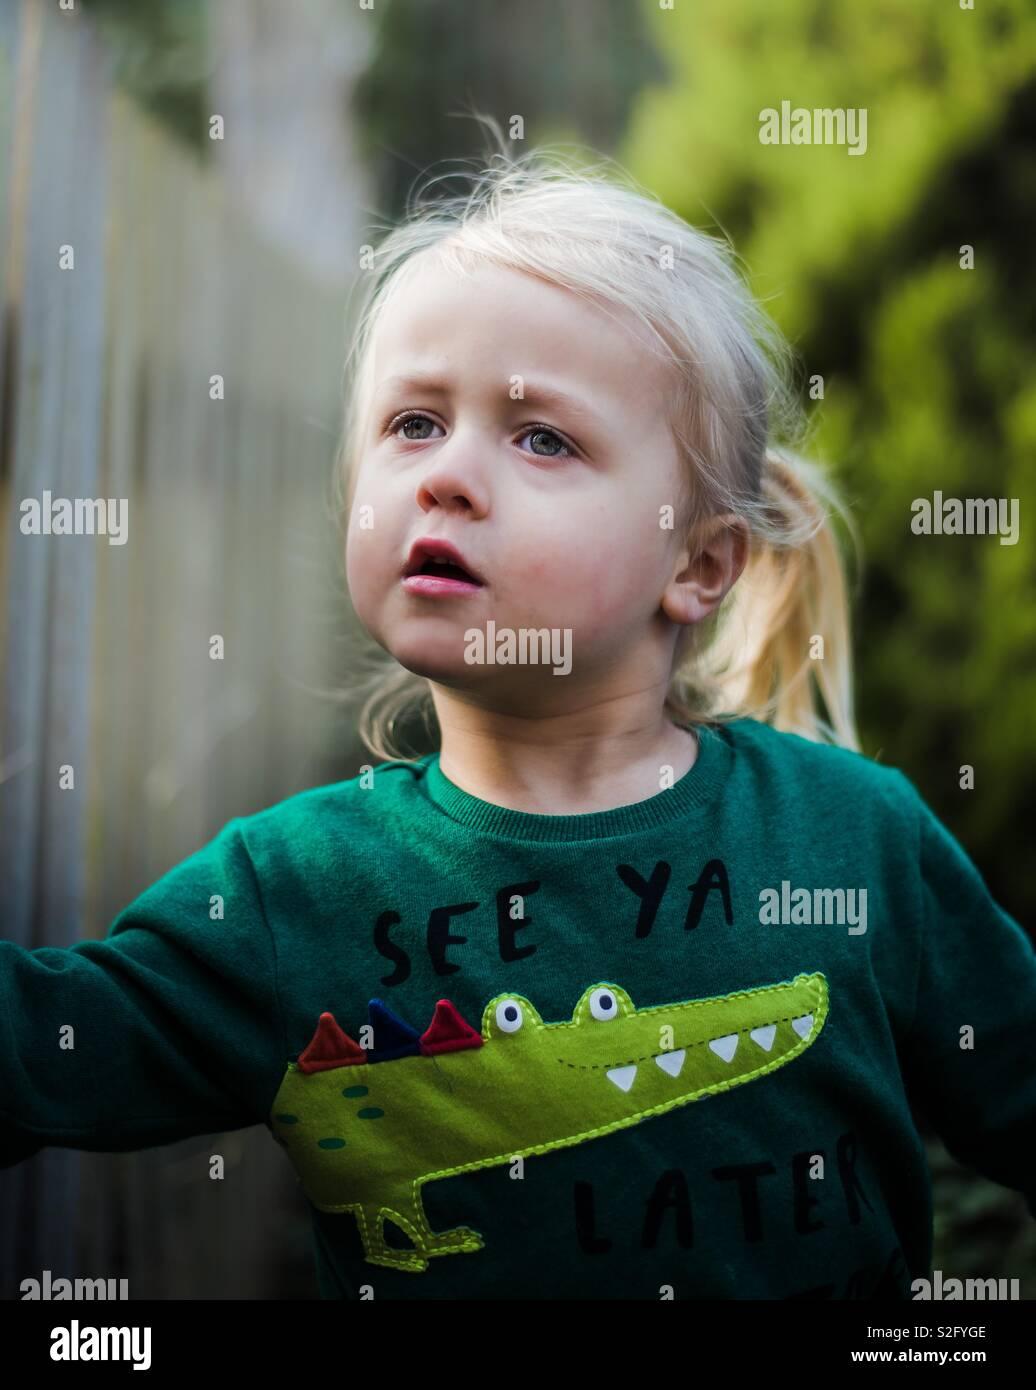 Wandering child - Stock Image